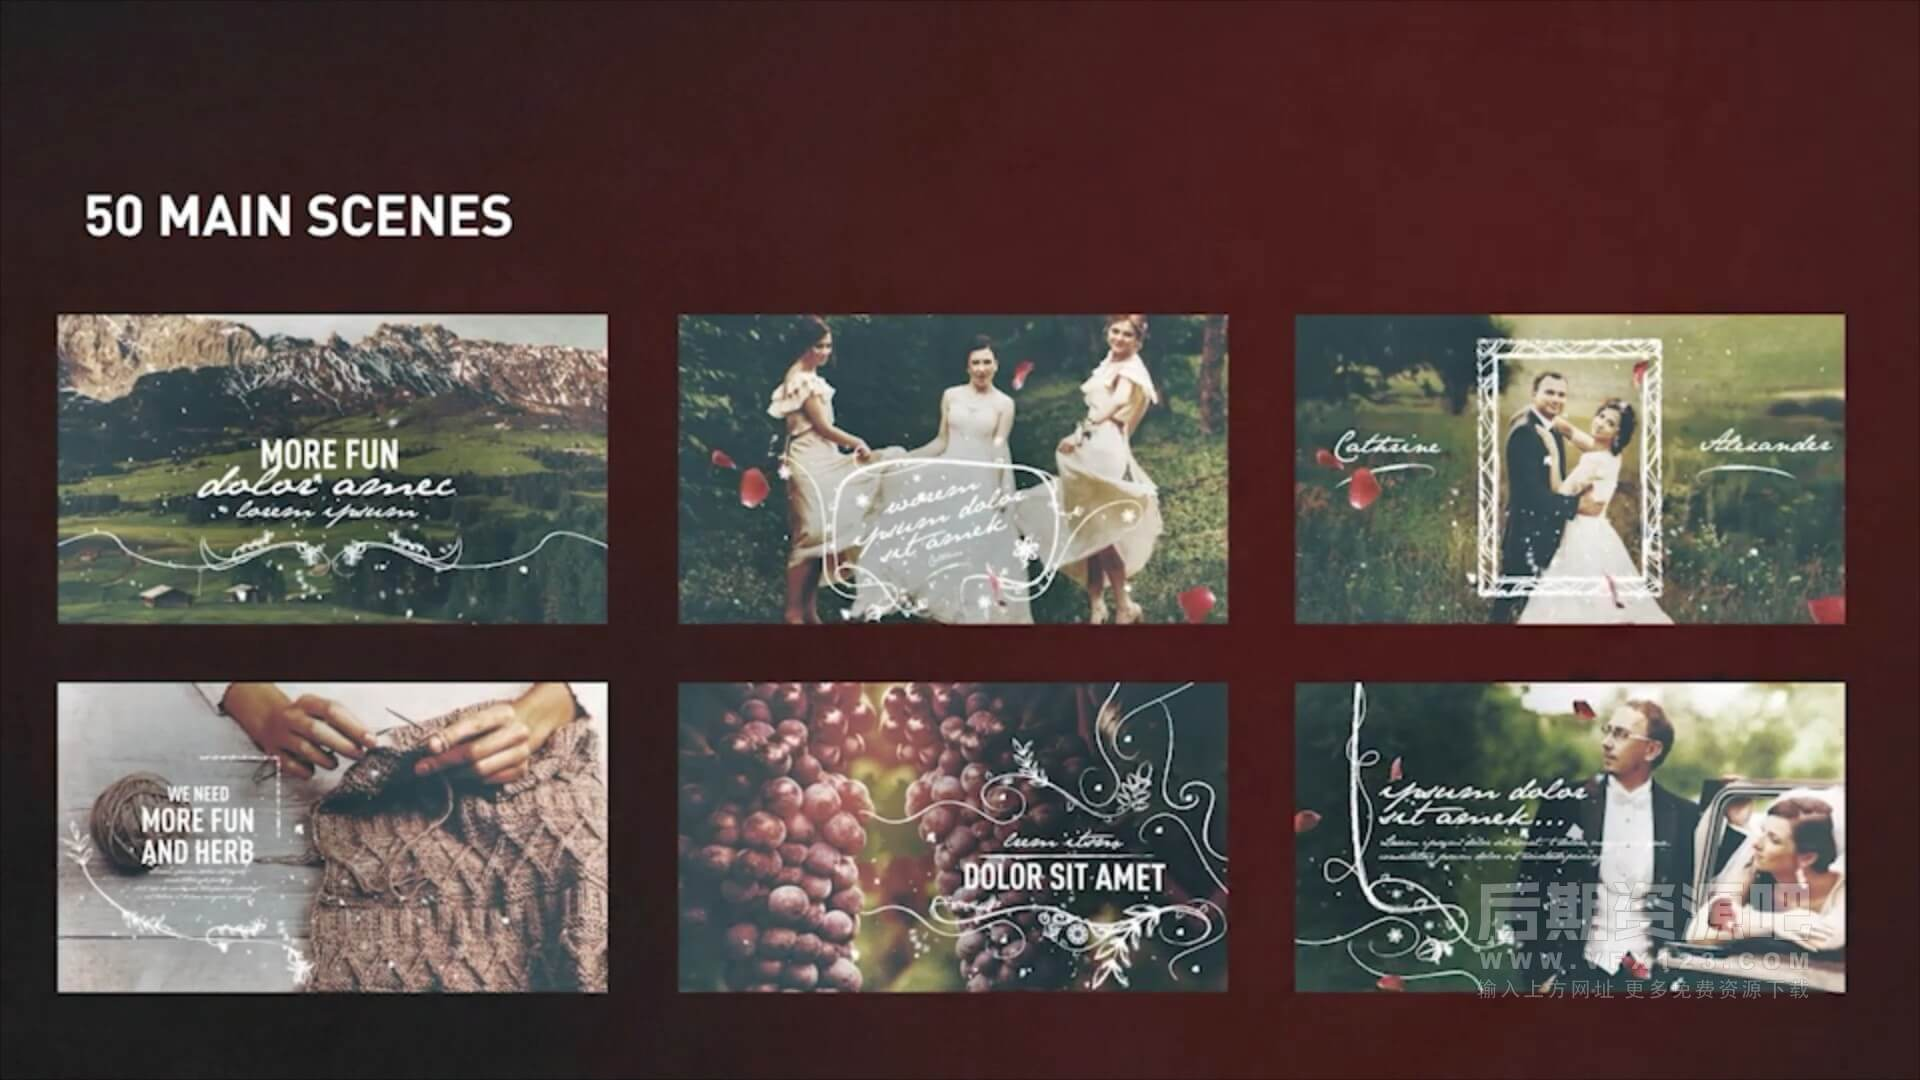 AE模板 浪漫婚礼MV回忆纪念册视频模板工具包 Wedding Memories Slideshow